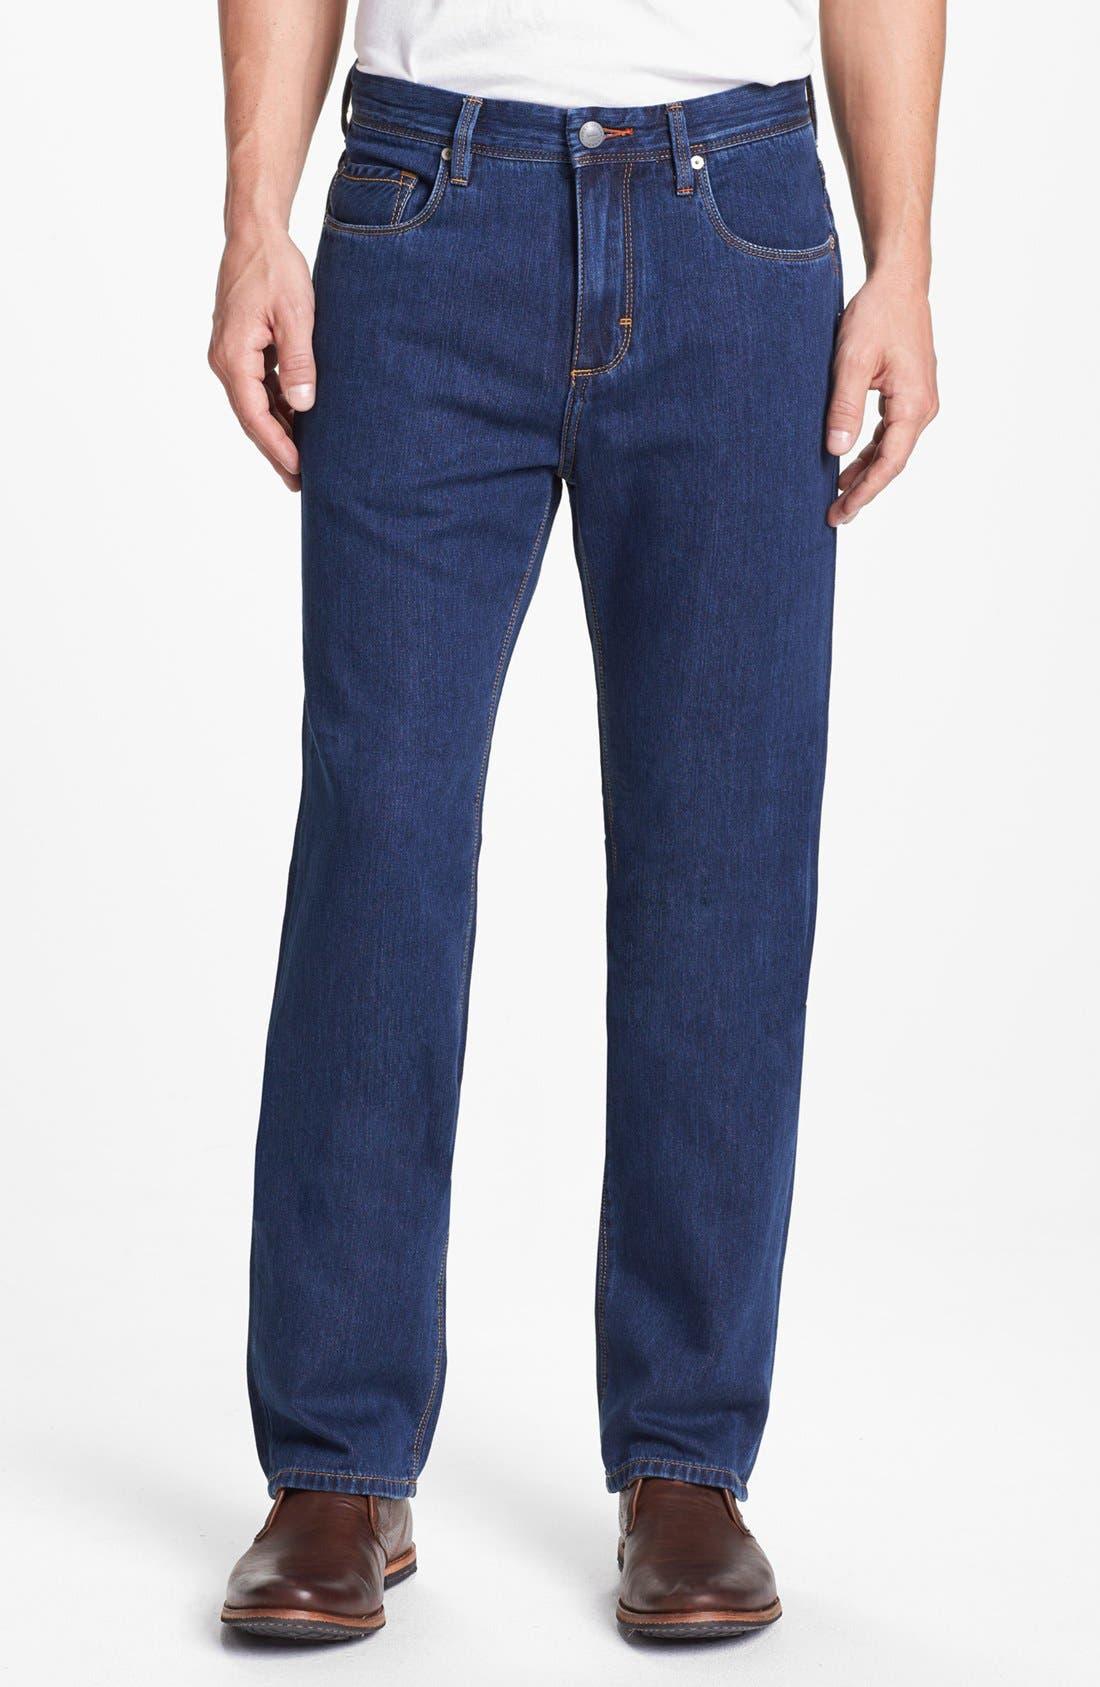 Alternate Image 1 Selected - Tommy Bahama Denim 'Coastal Island' Standard Fit Jeans (Medium)